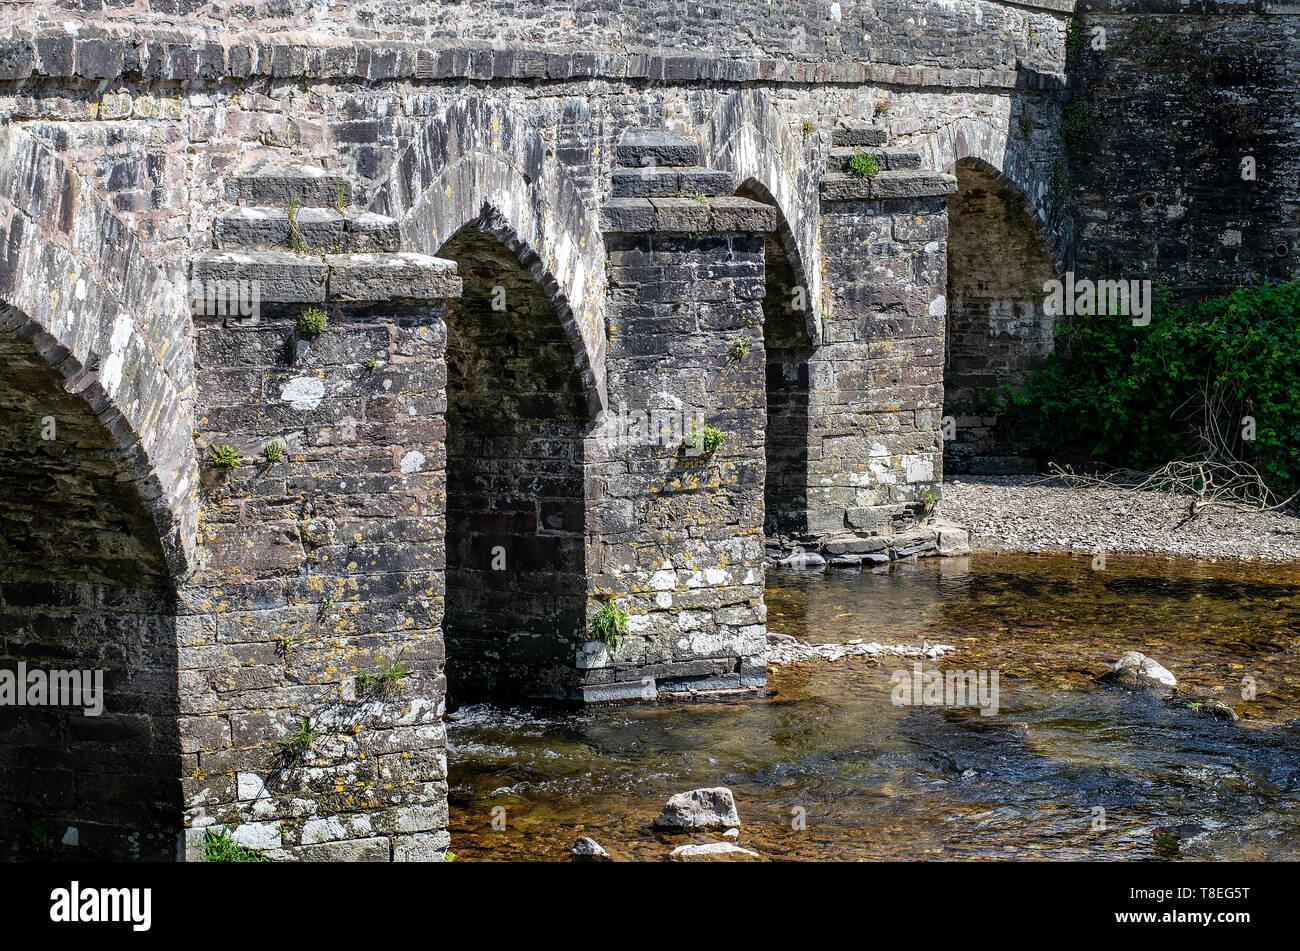 A view of the road bridge in Dulverton, Somerset, England, UK - Stock Image